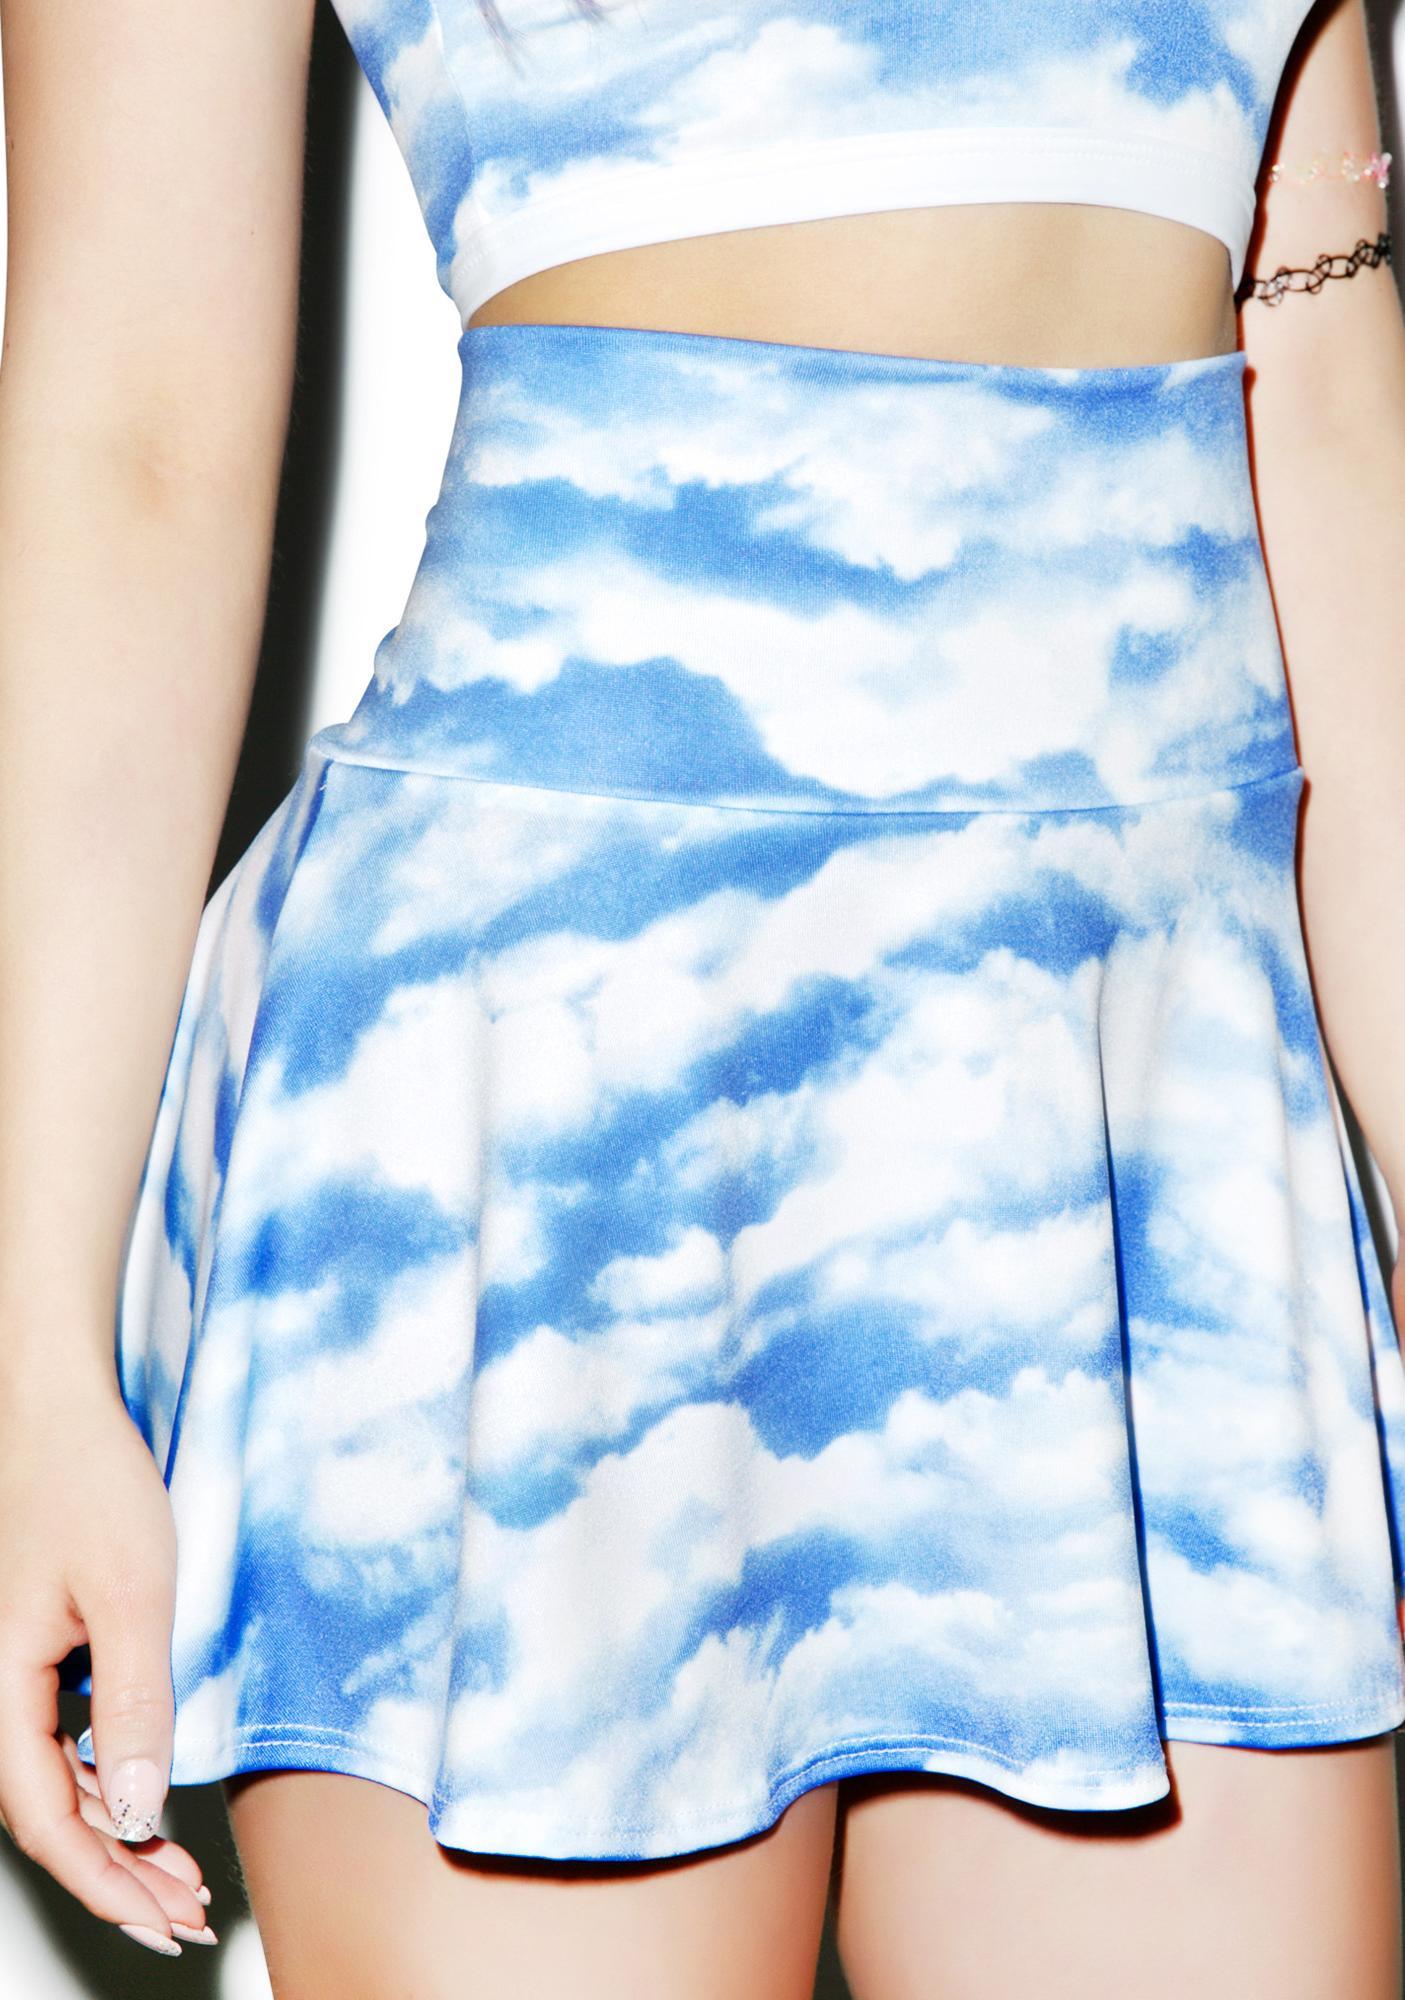 J Valentine Gettin' Cloudy Skirt